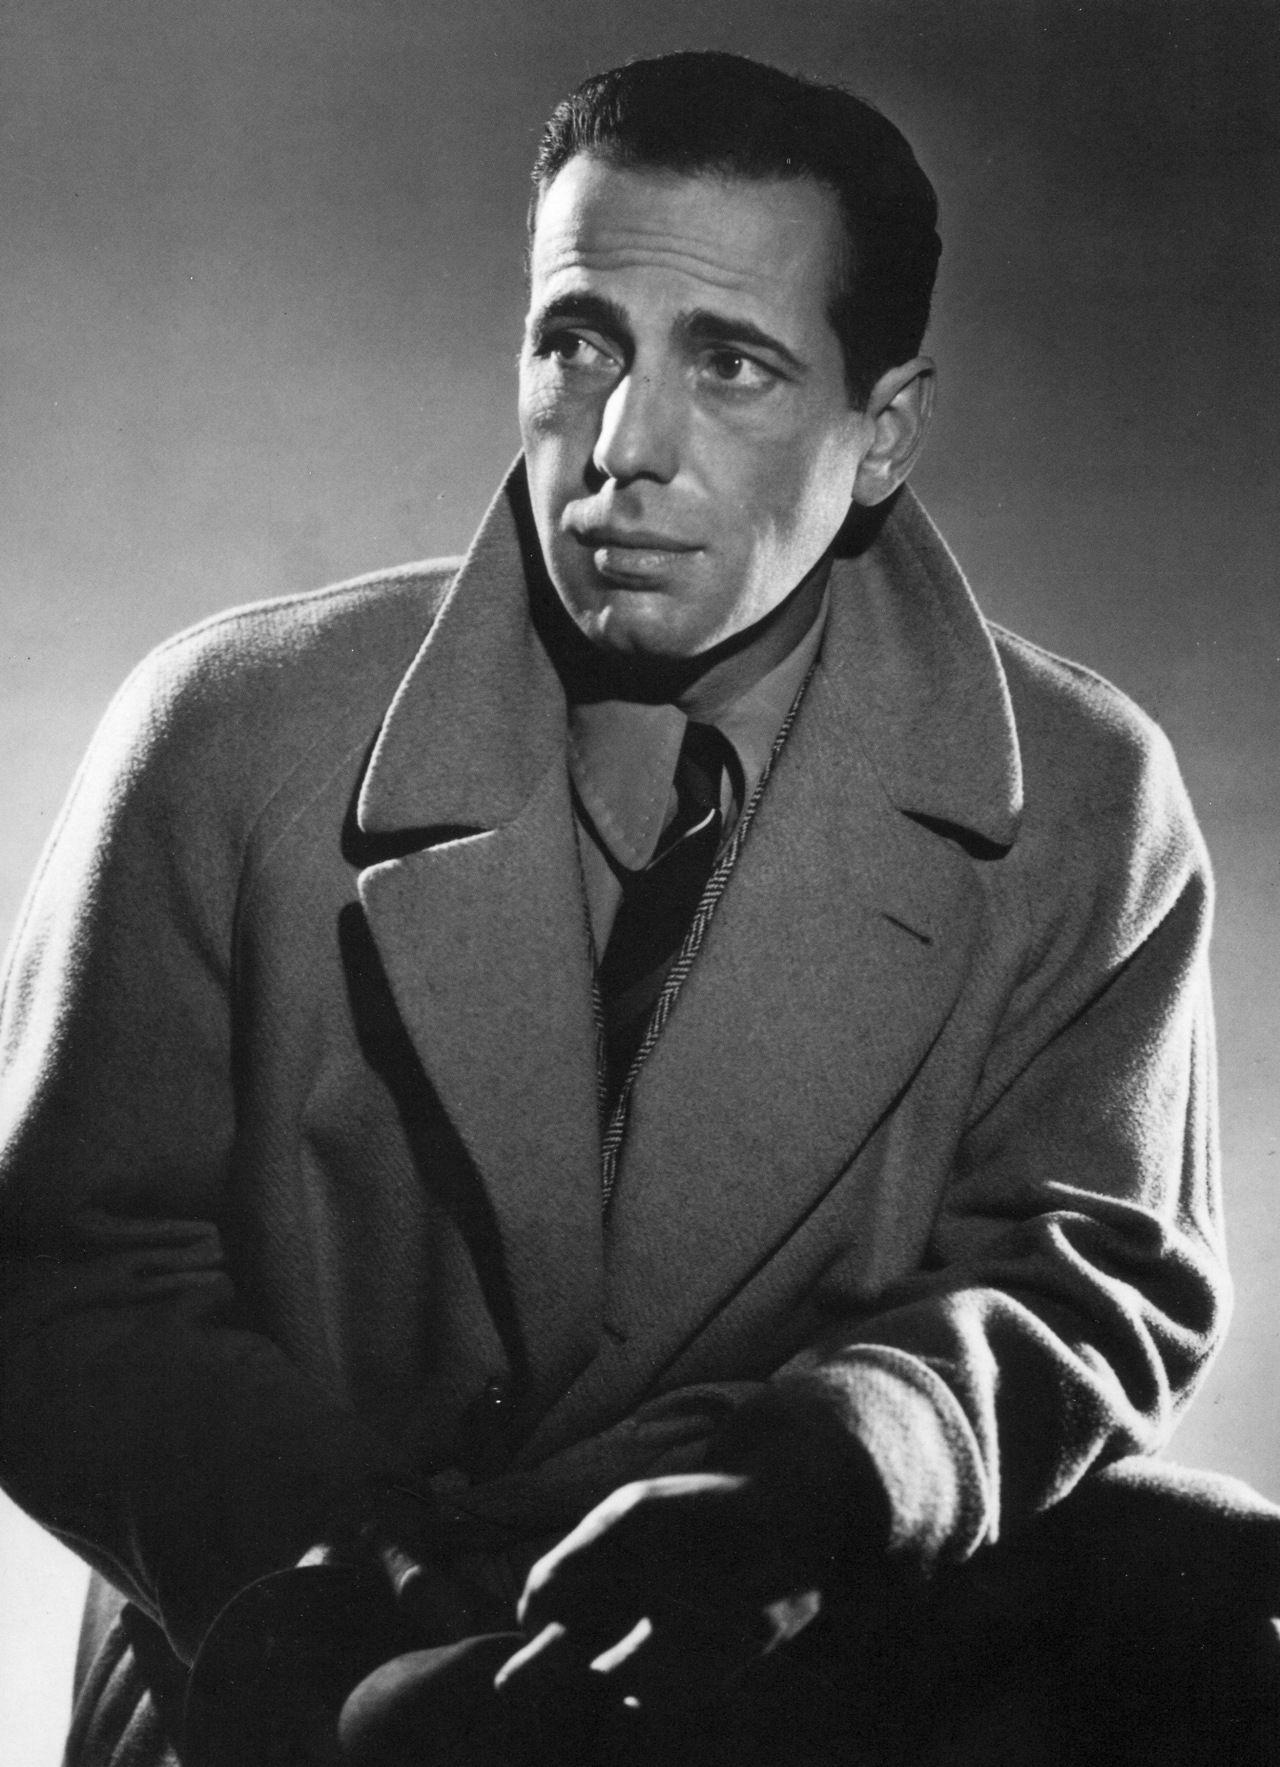 Humphrey Bogart In A Publicity Photo For The Maltese Falcon Directed By John Huston 1941 Humphrey Bogart Bogart Classic Movie Stars